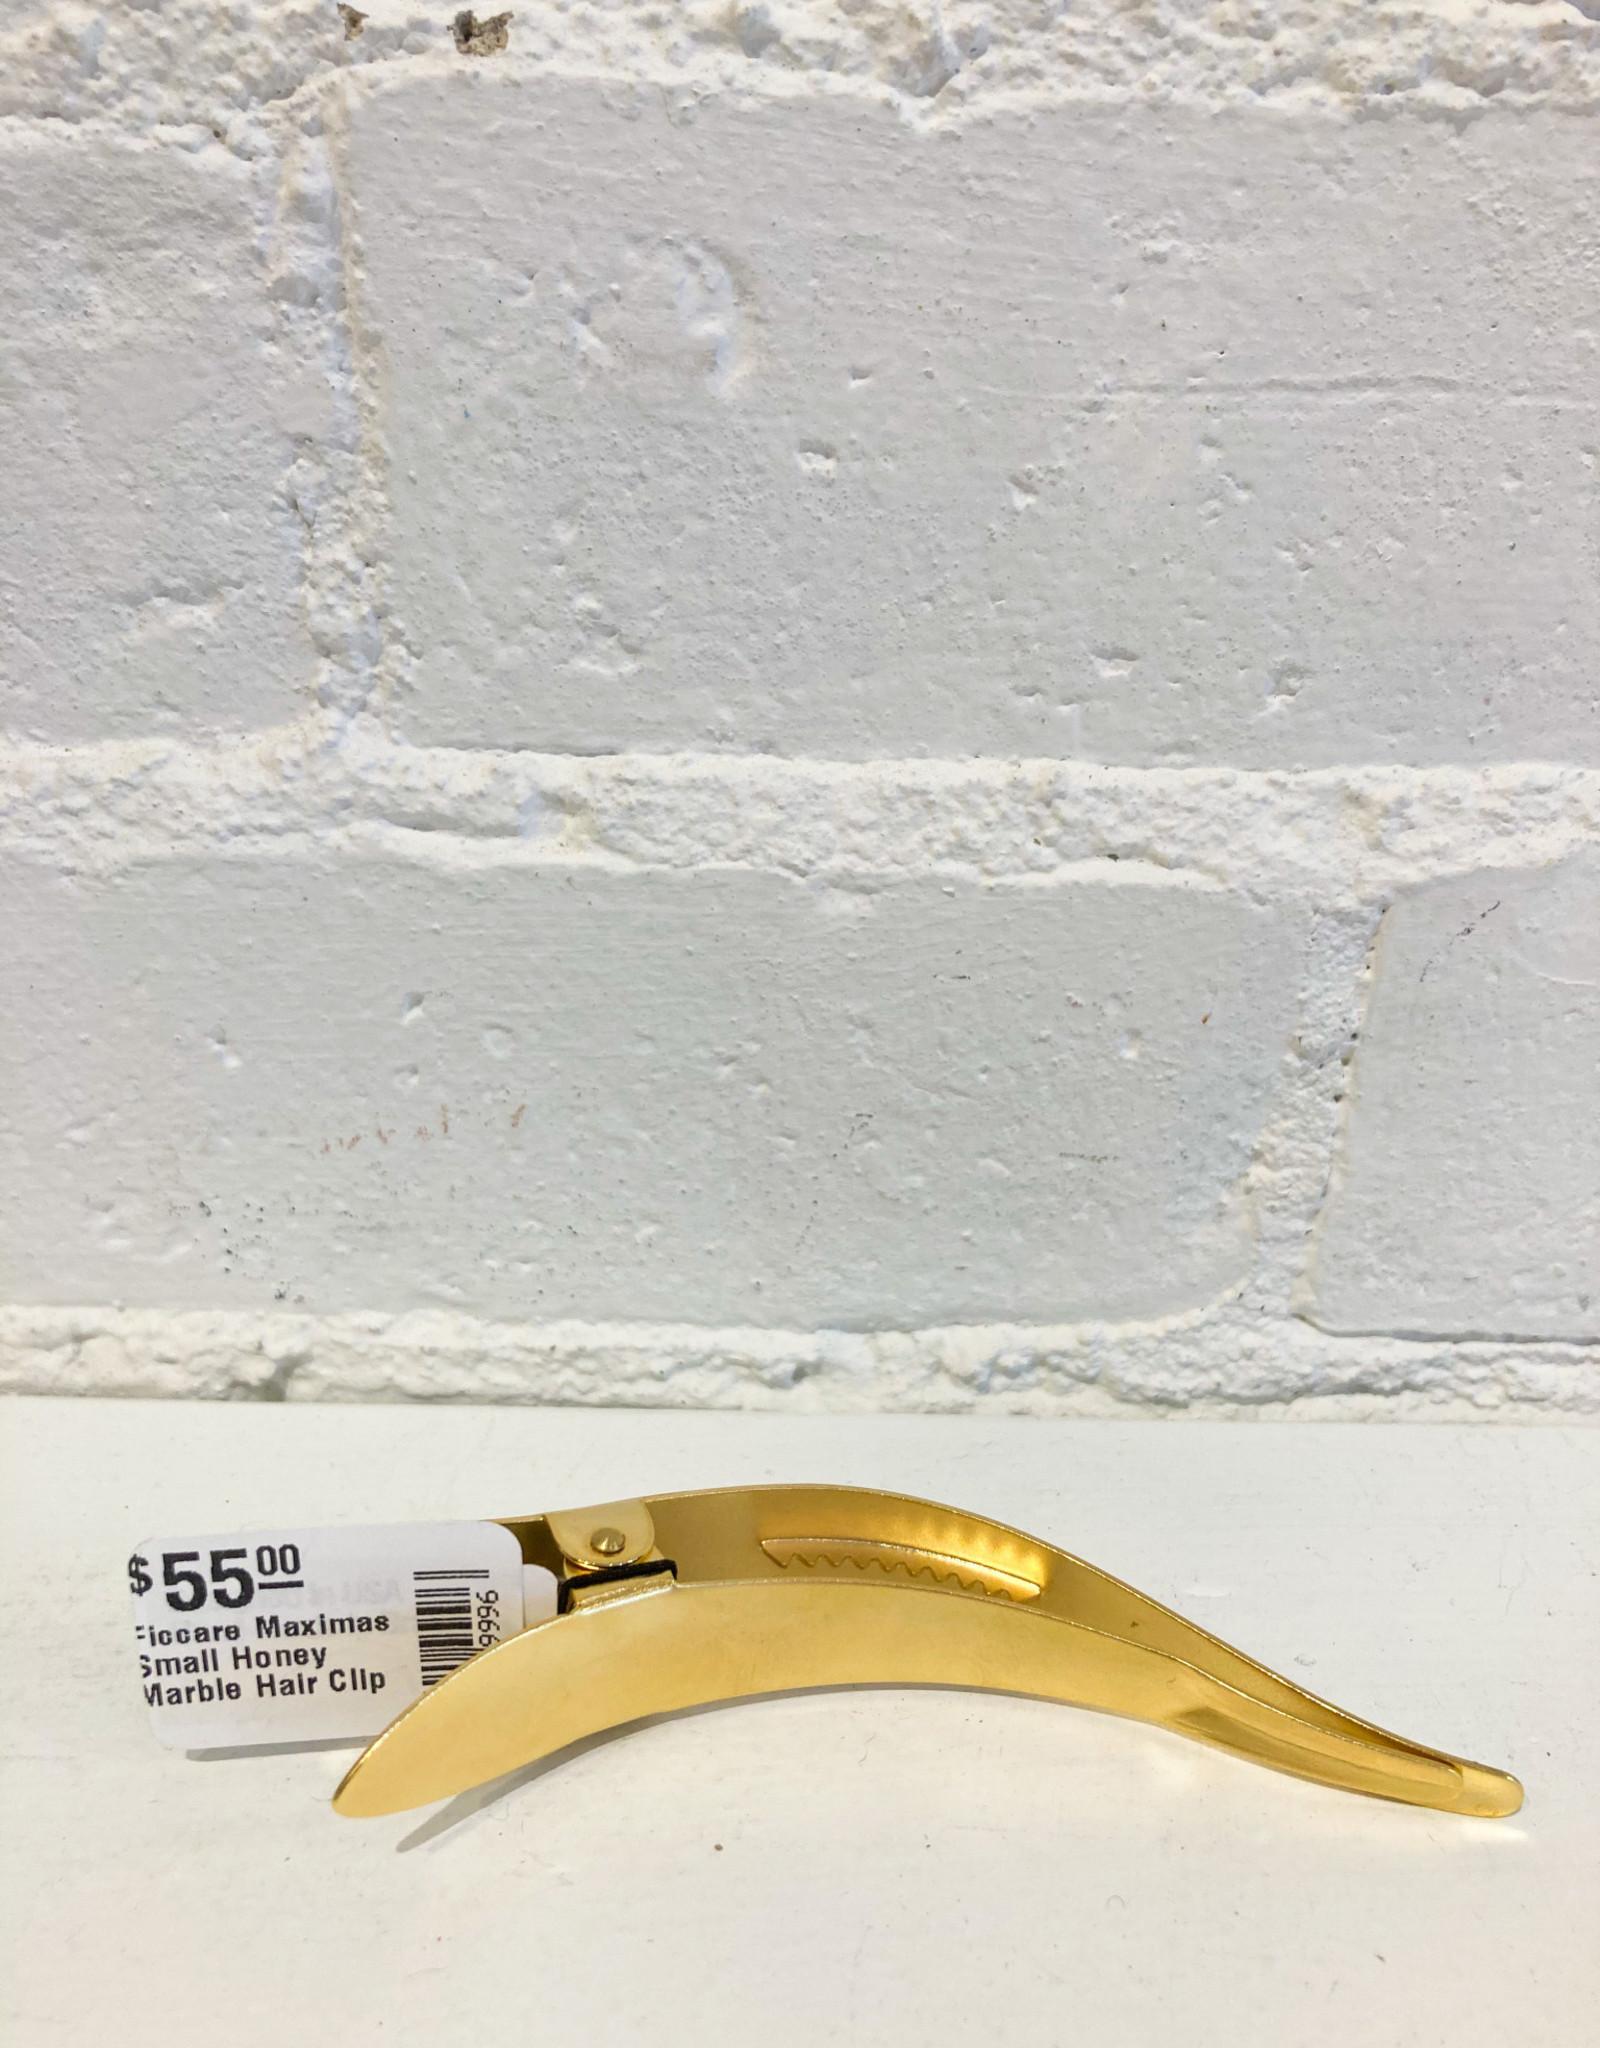 Ficcare Maximas Small Honey Marble Hair Clip